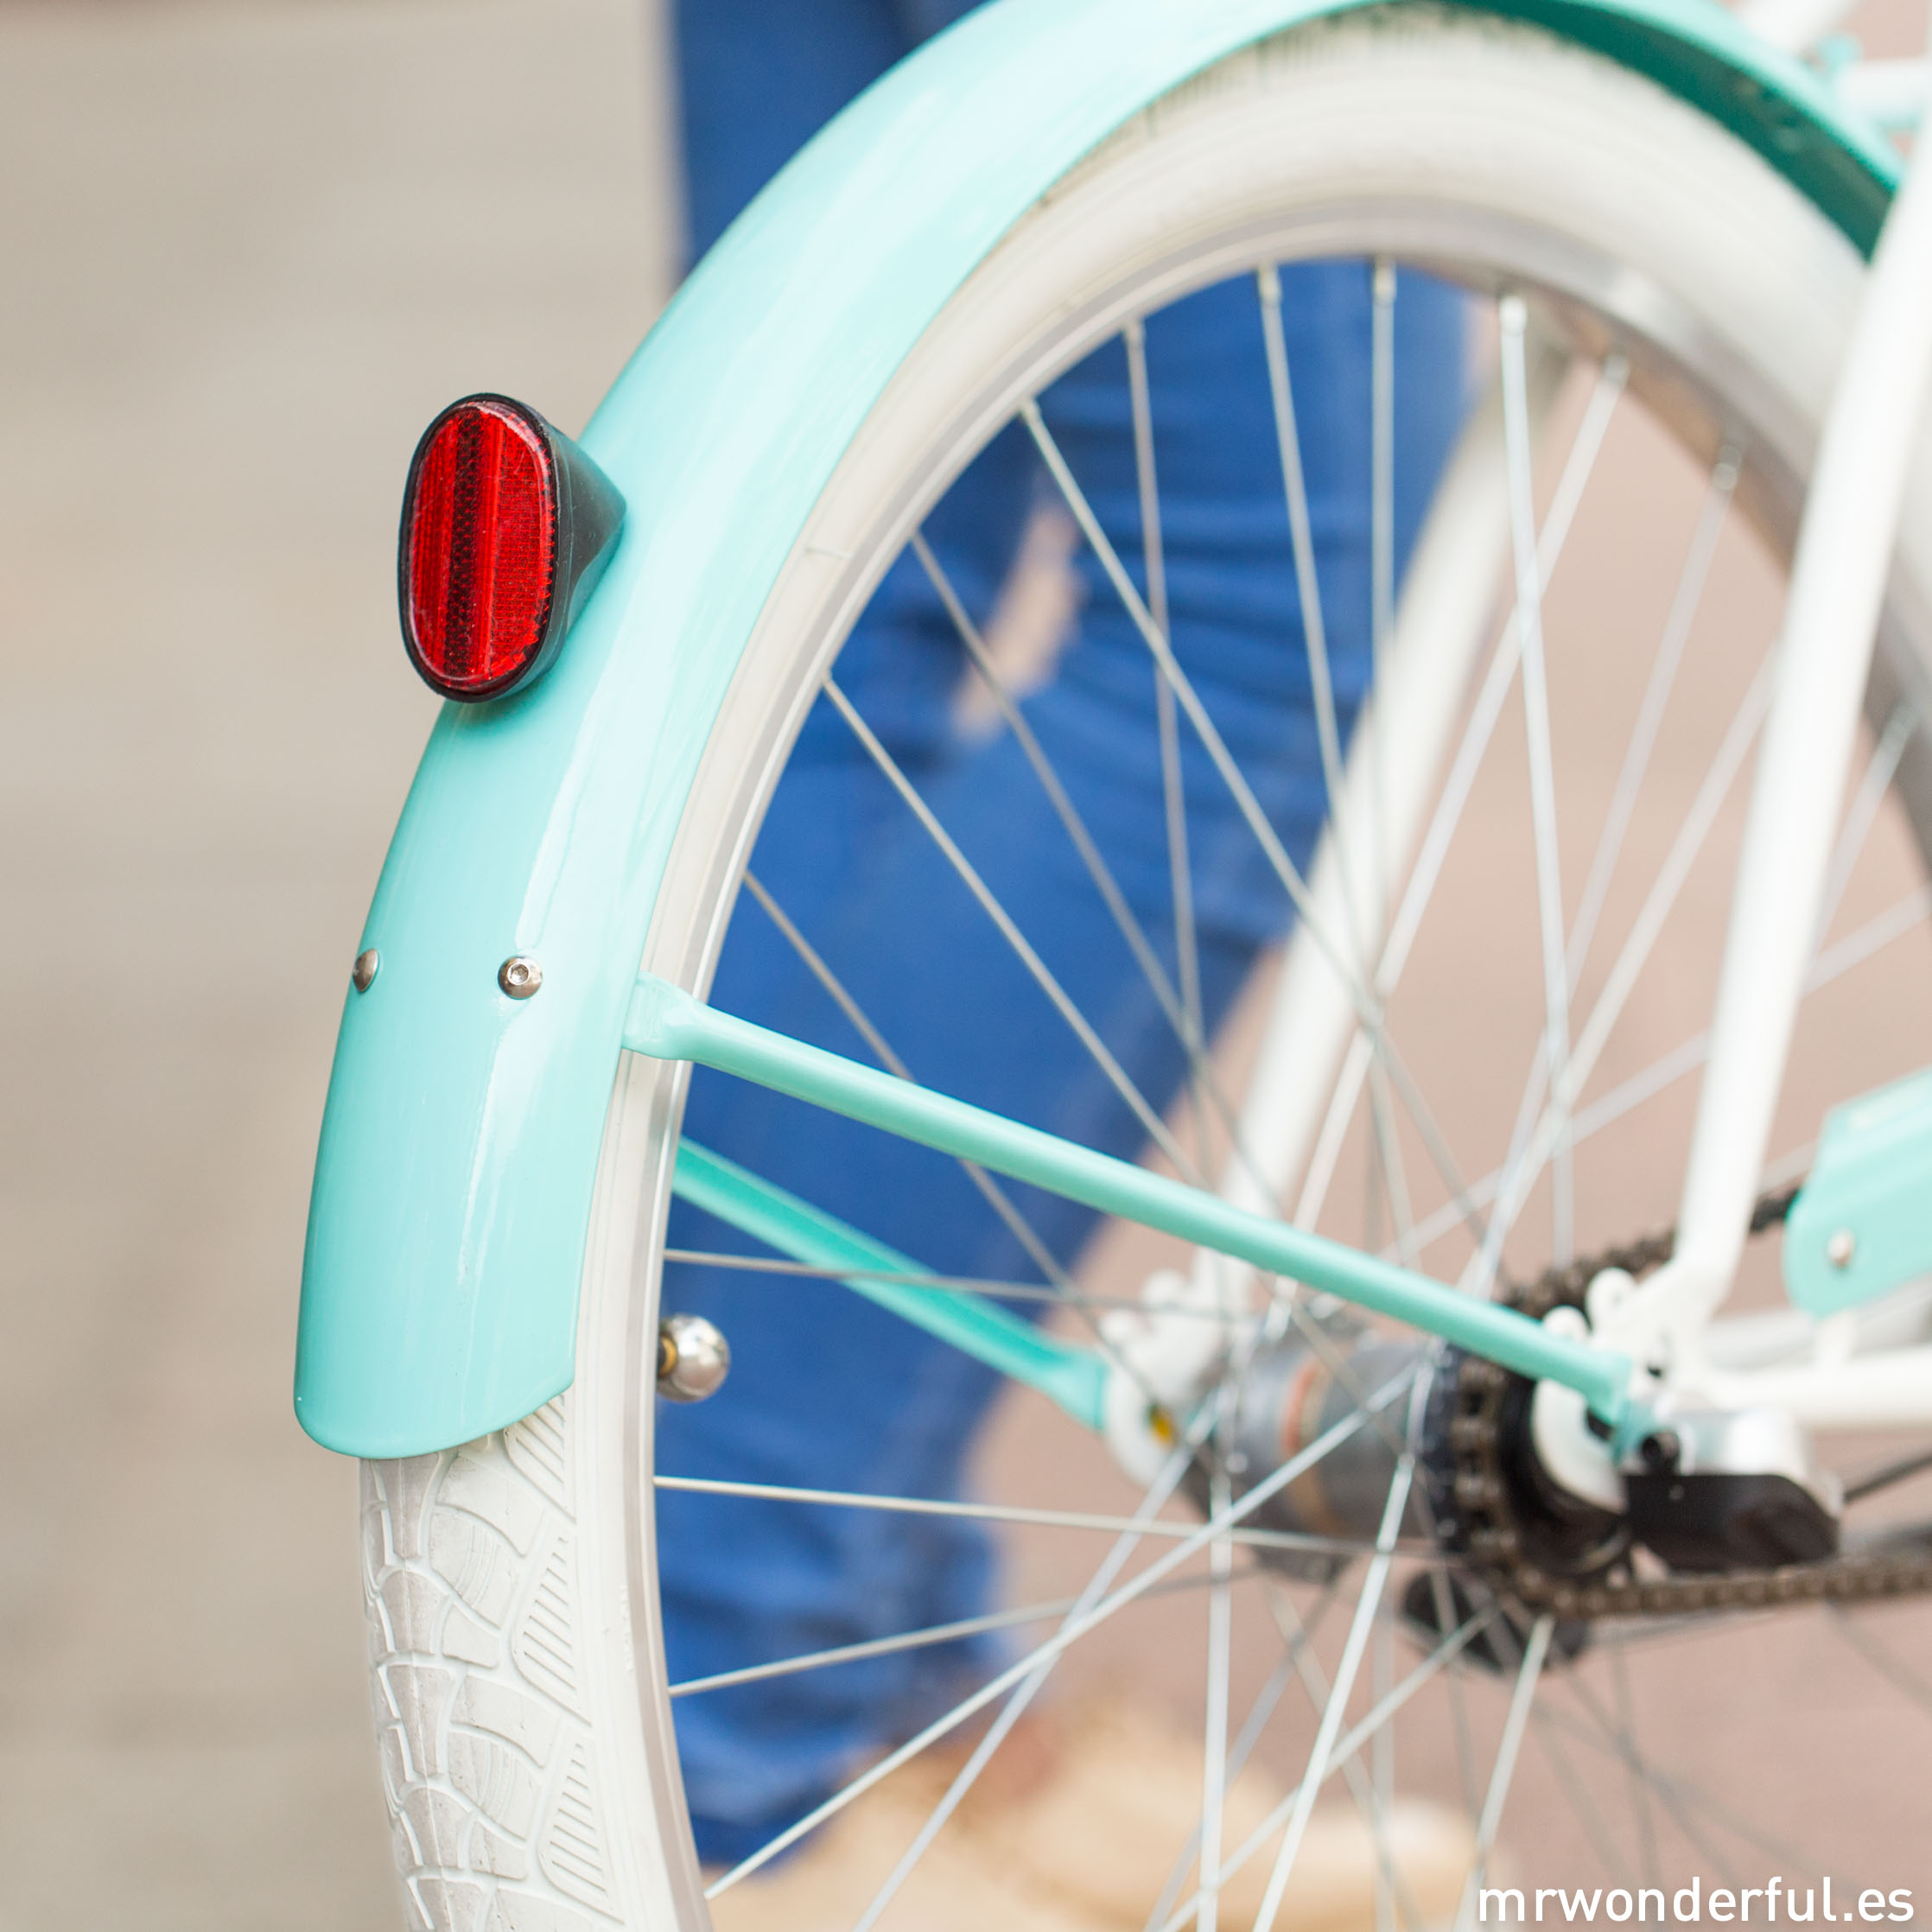 mrwonderful_concurso-bicicleta-19-Editar